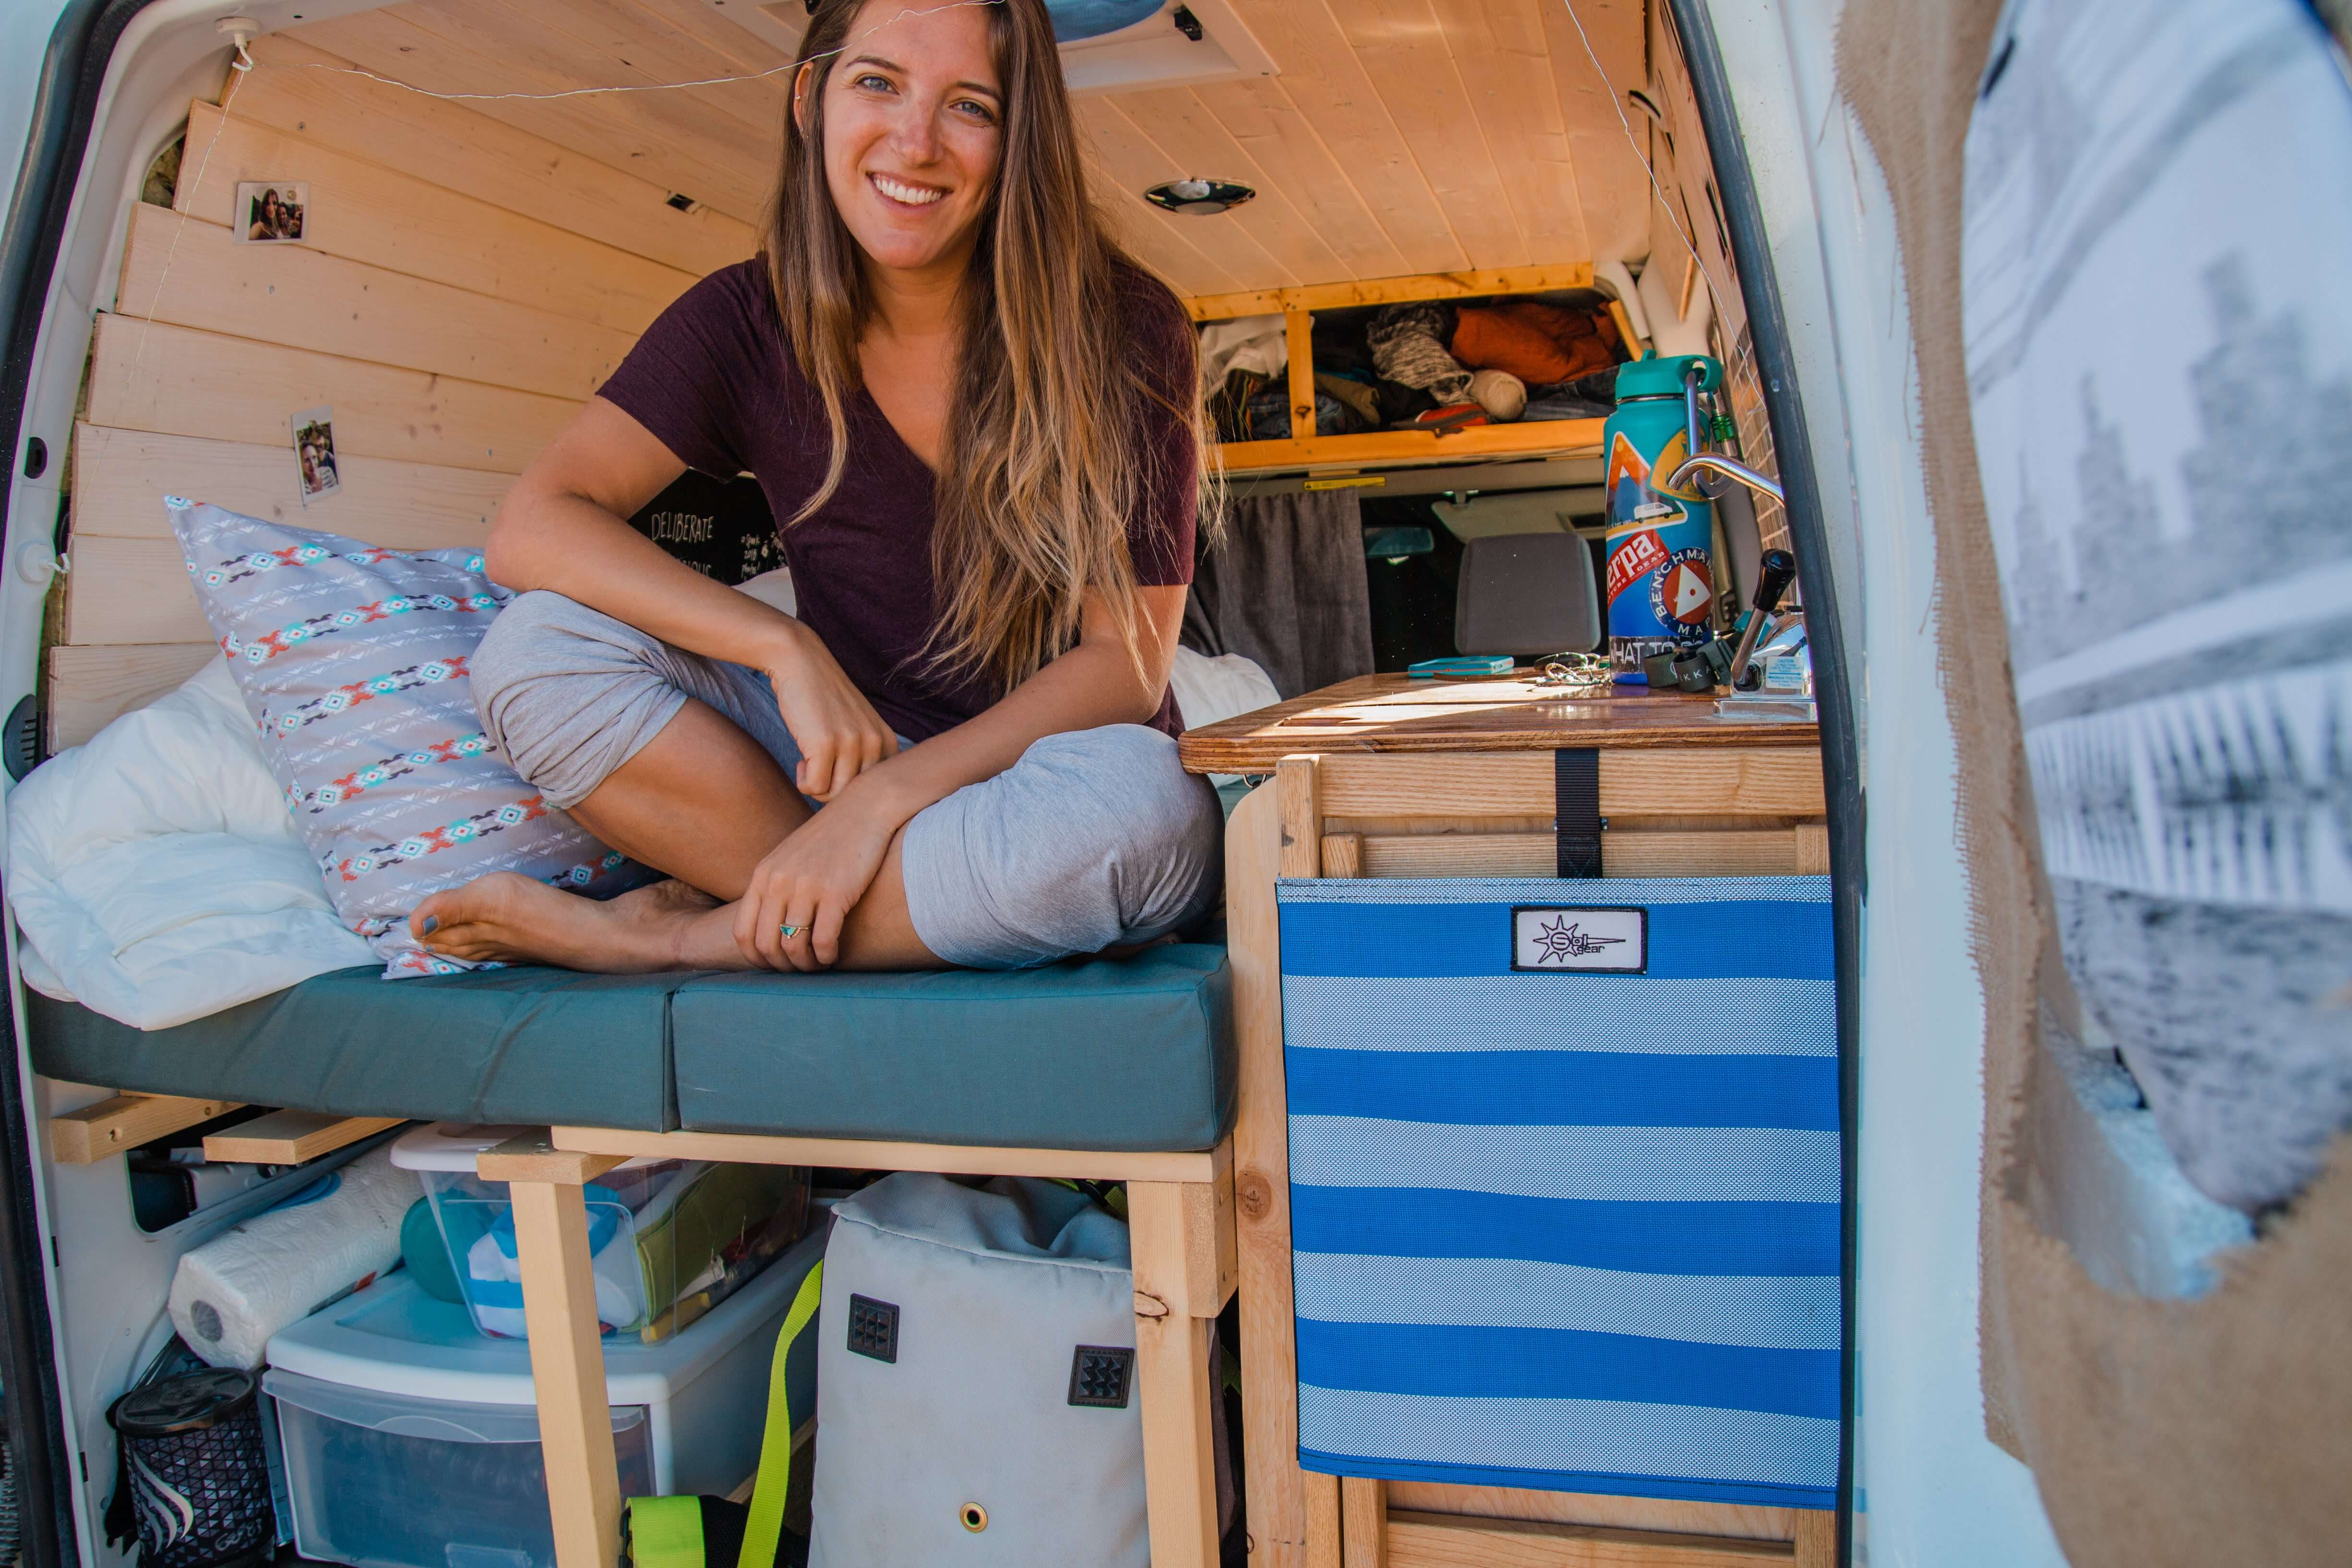 solo female van life renovation Instagram couple blog